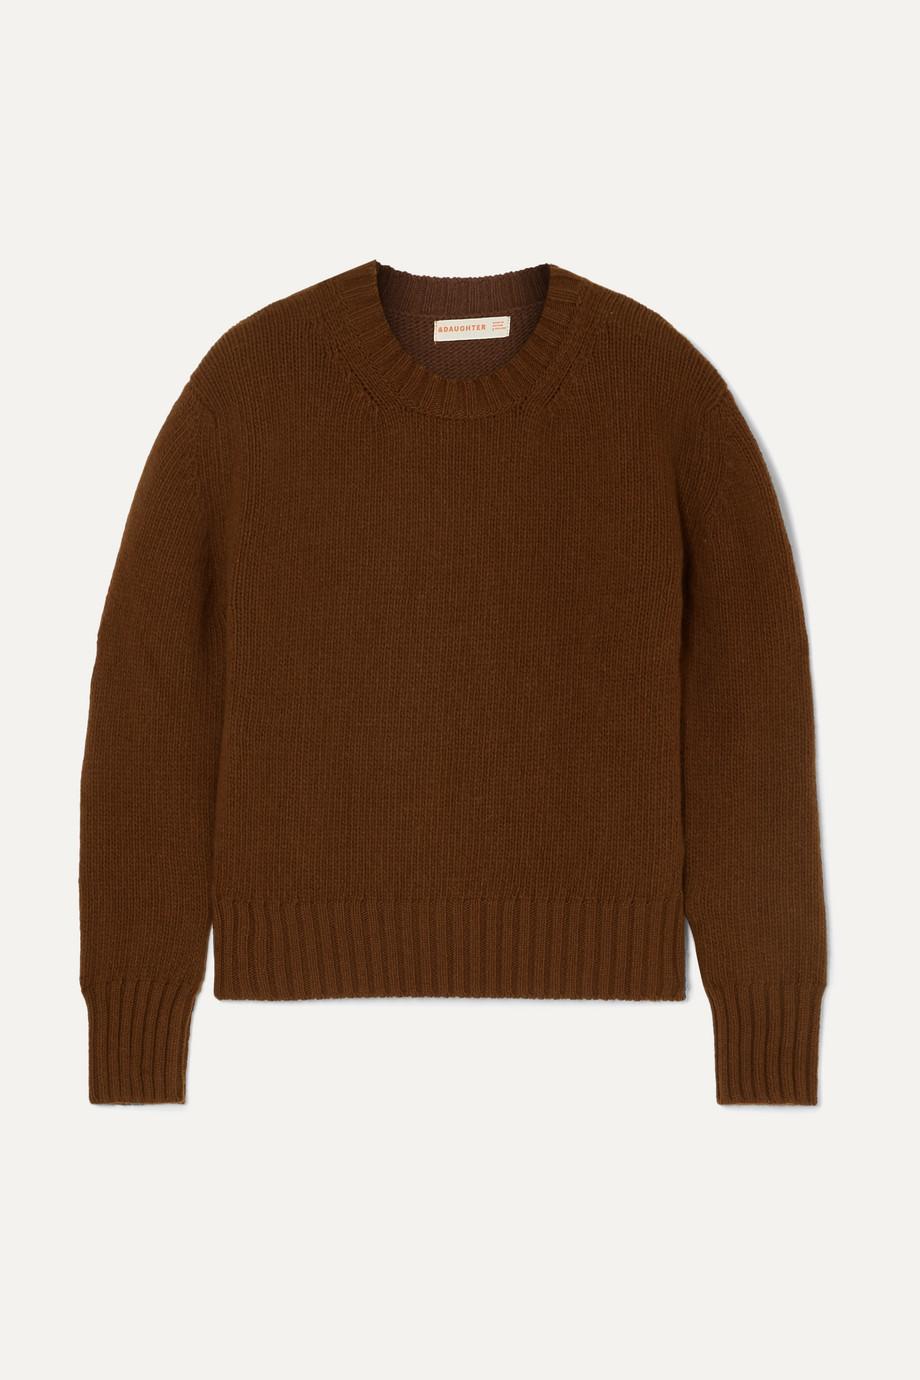 &Daughter Enda wool sweater